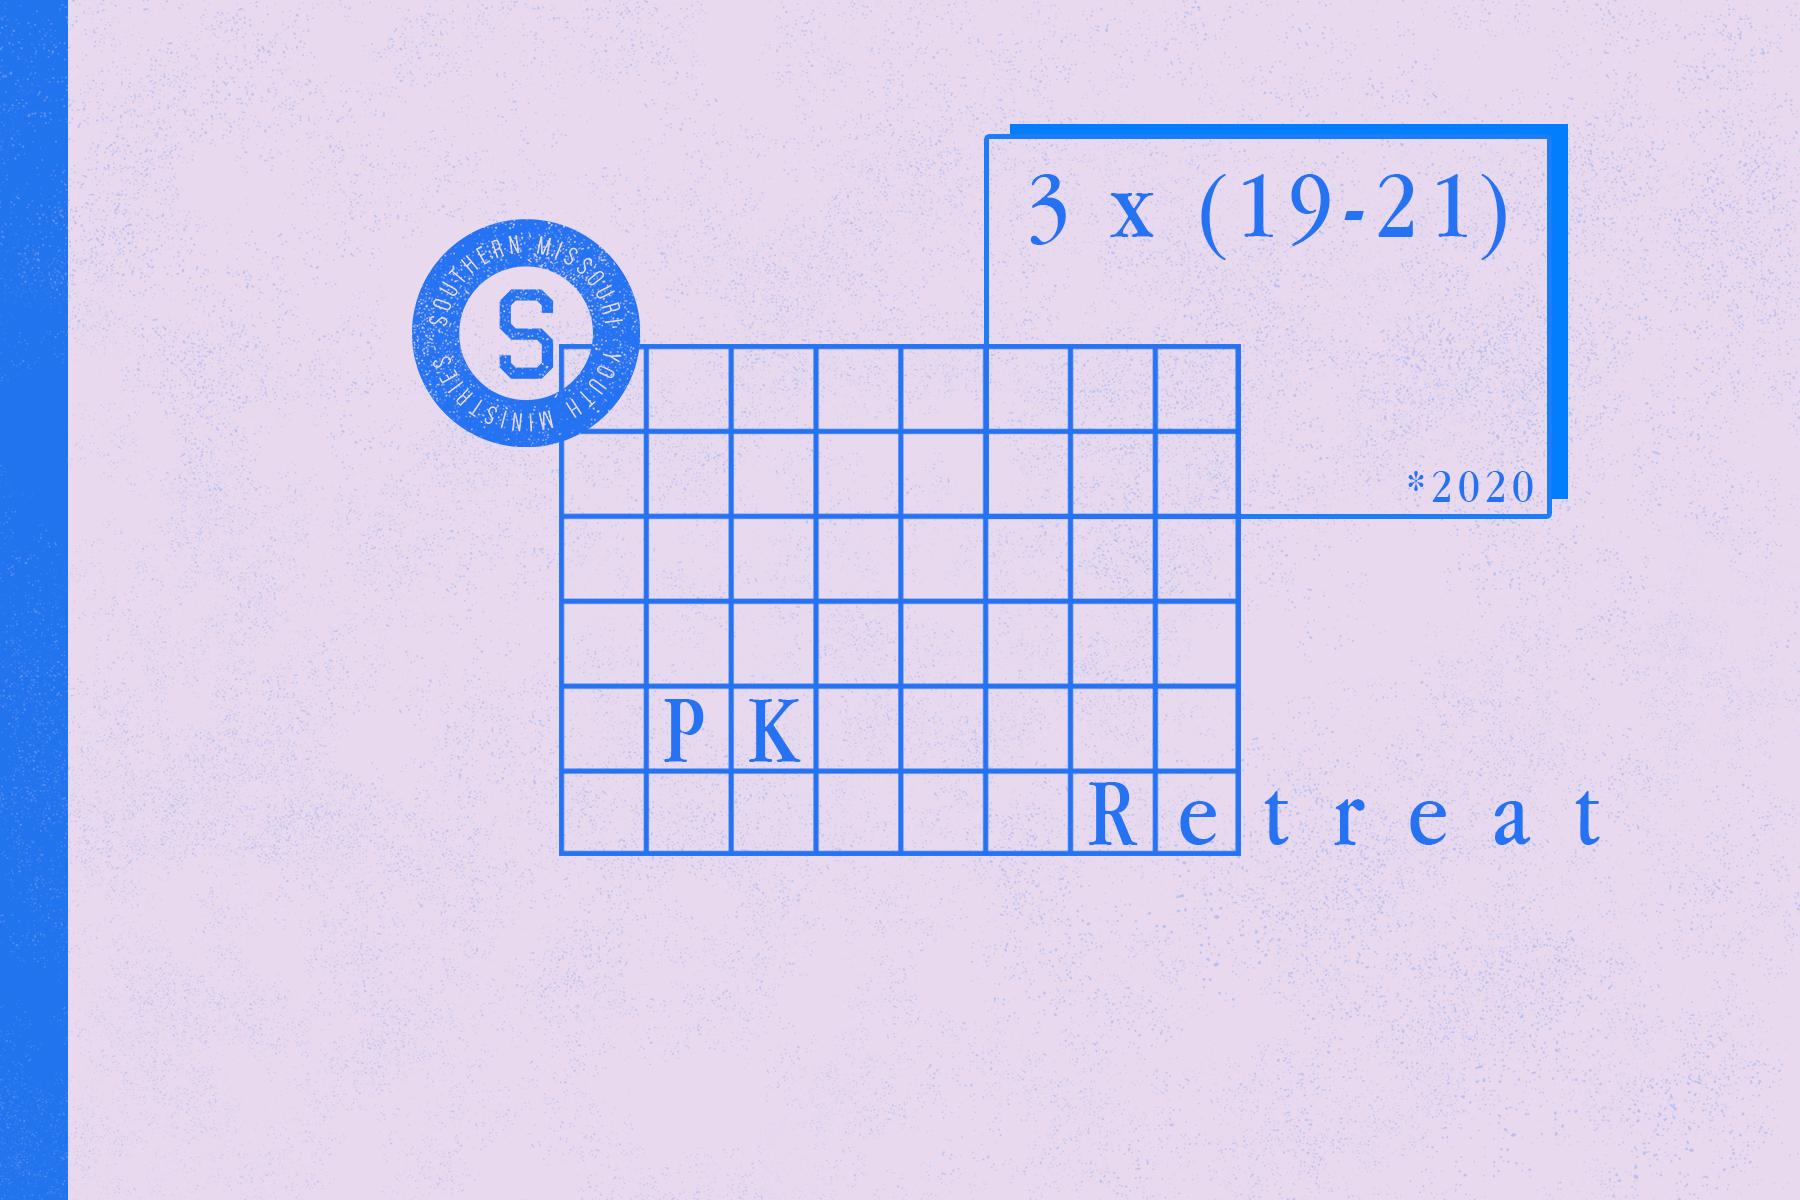 PK Retreat 2020 Graphic.png